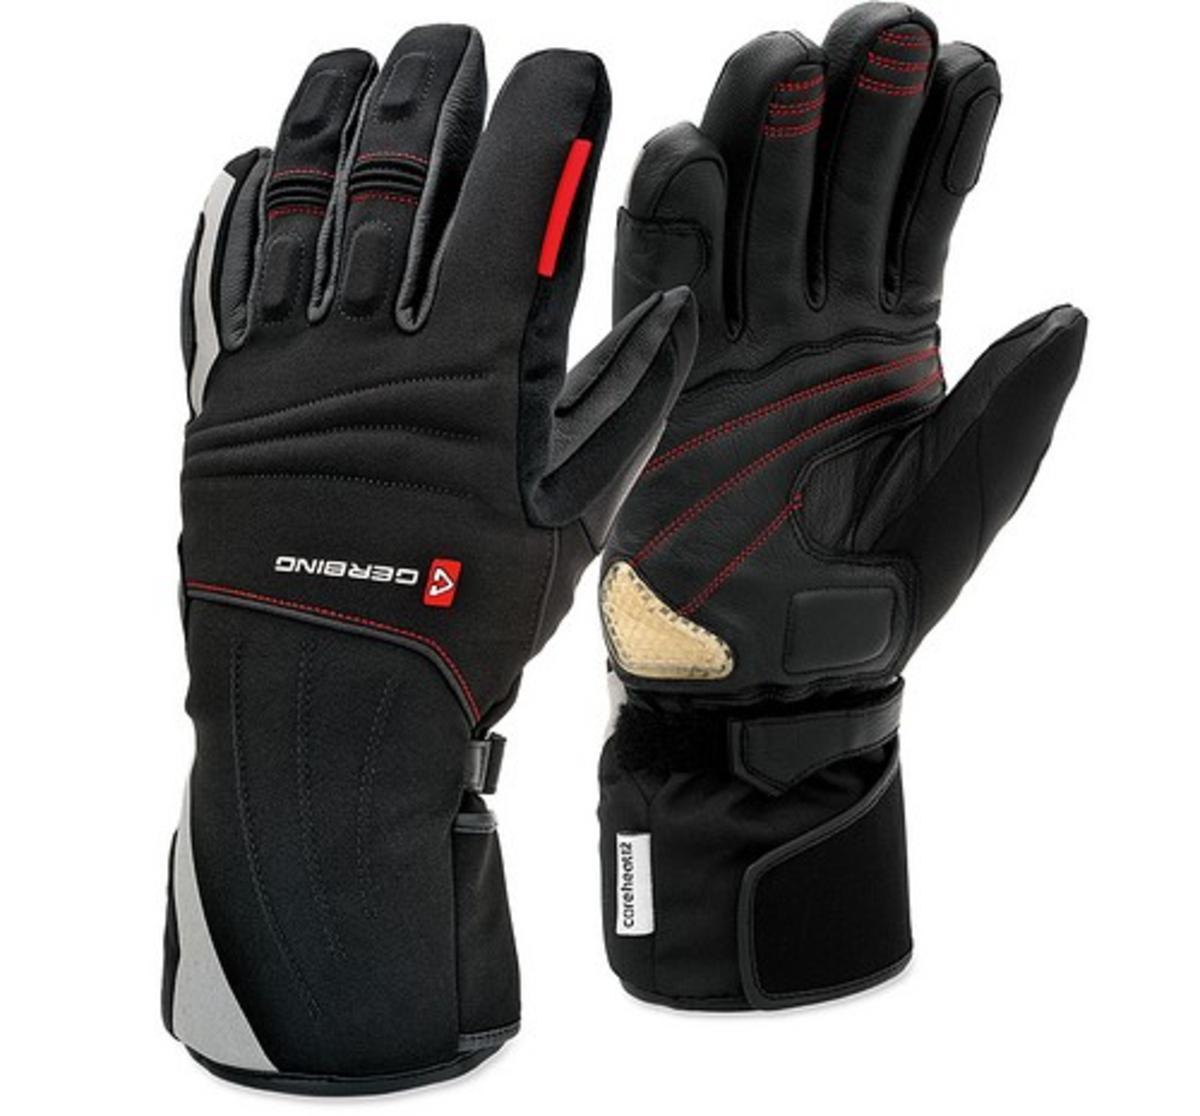 EX Pro Heated Gloves